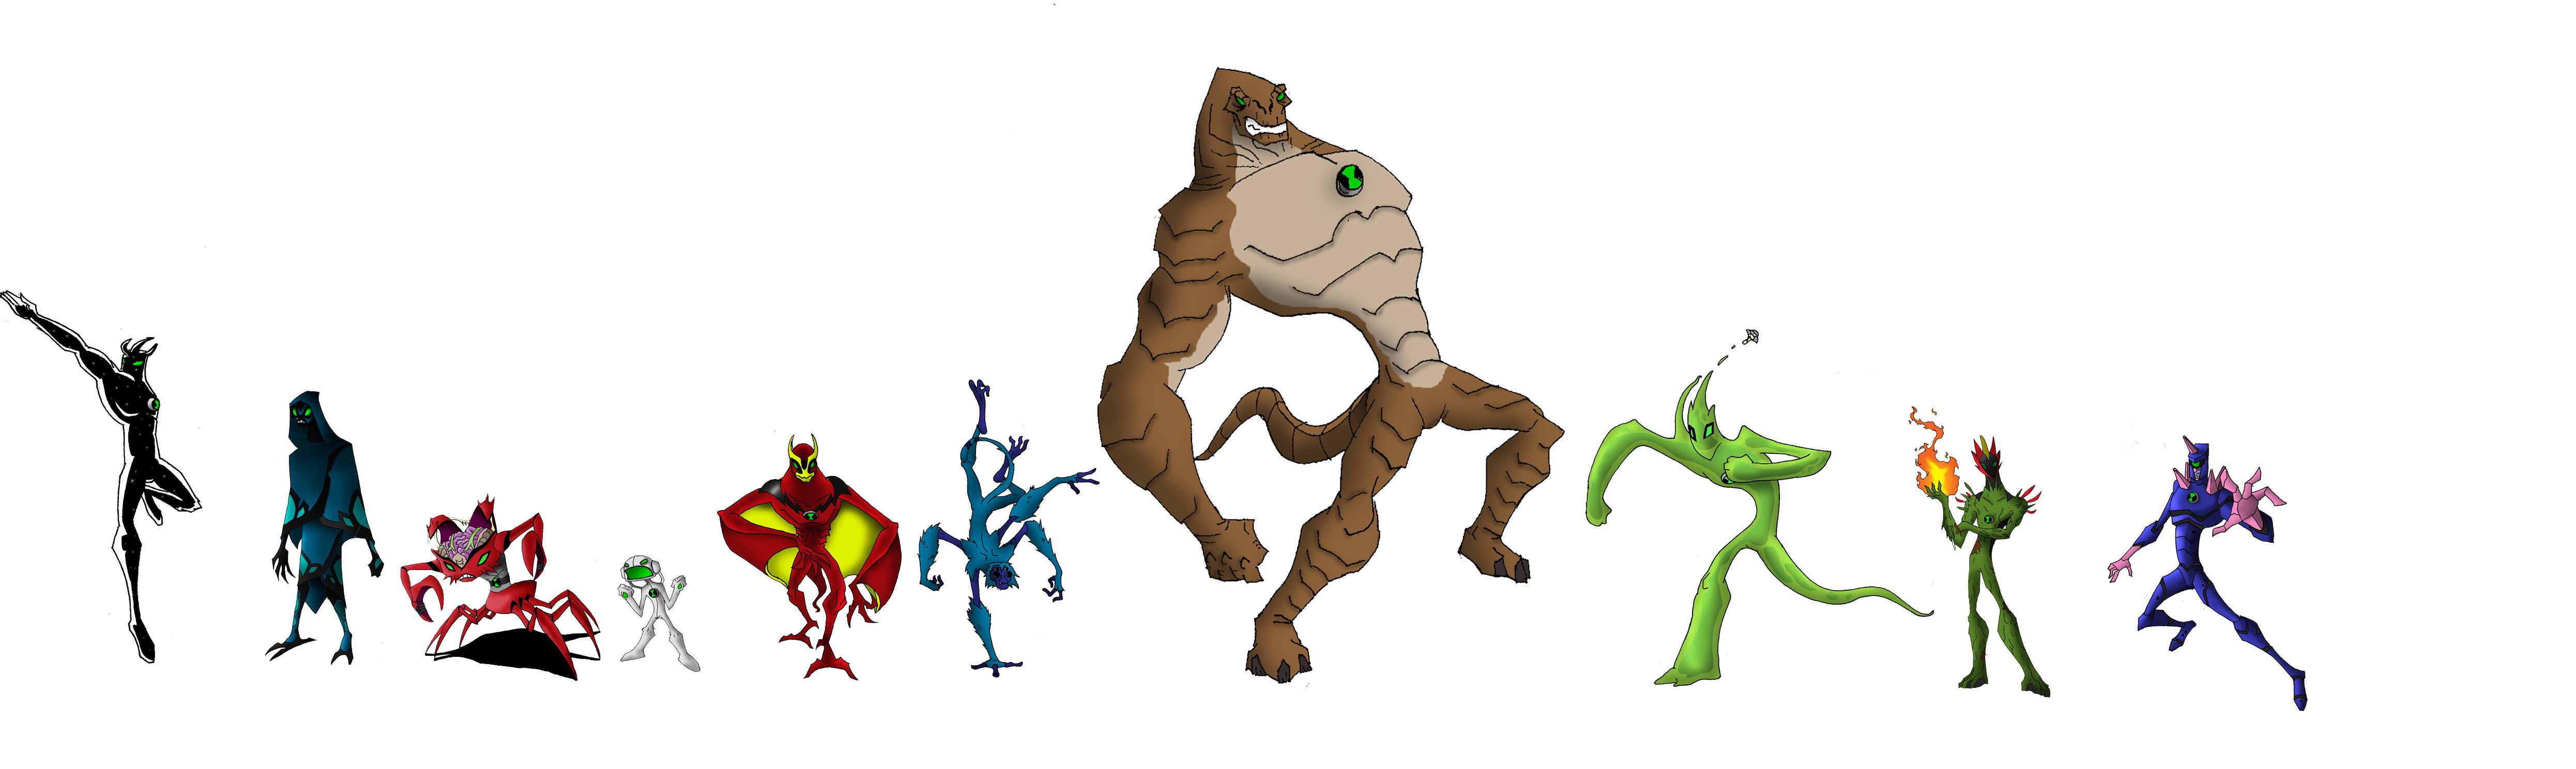 Ben 10 Alien Force Drawing At Getdrawings Free Download